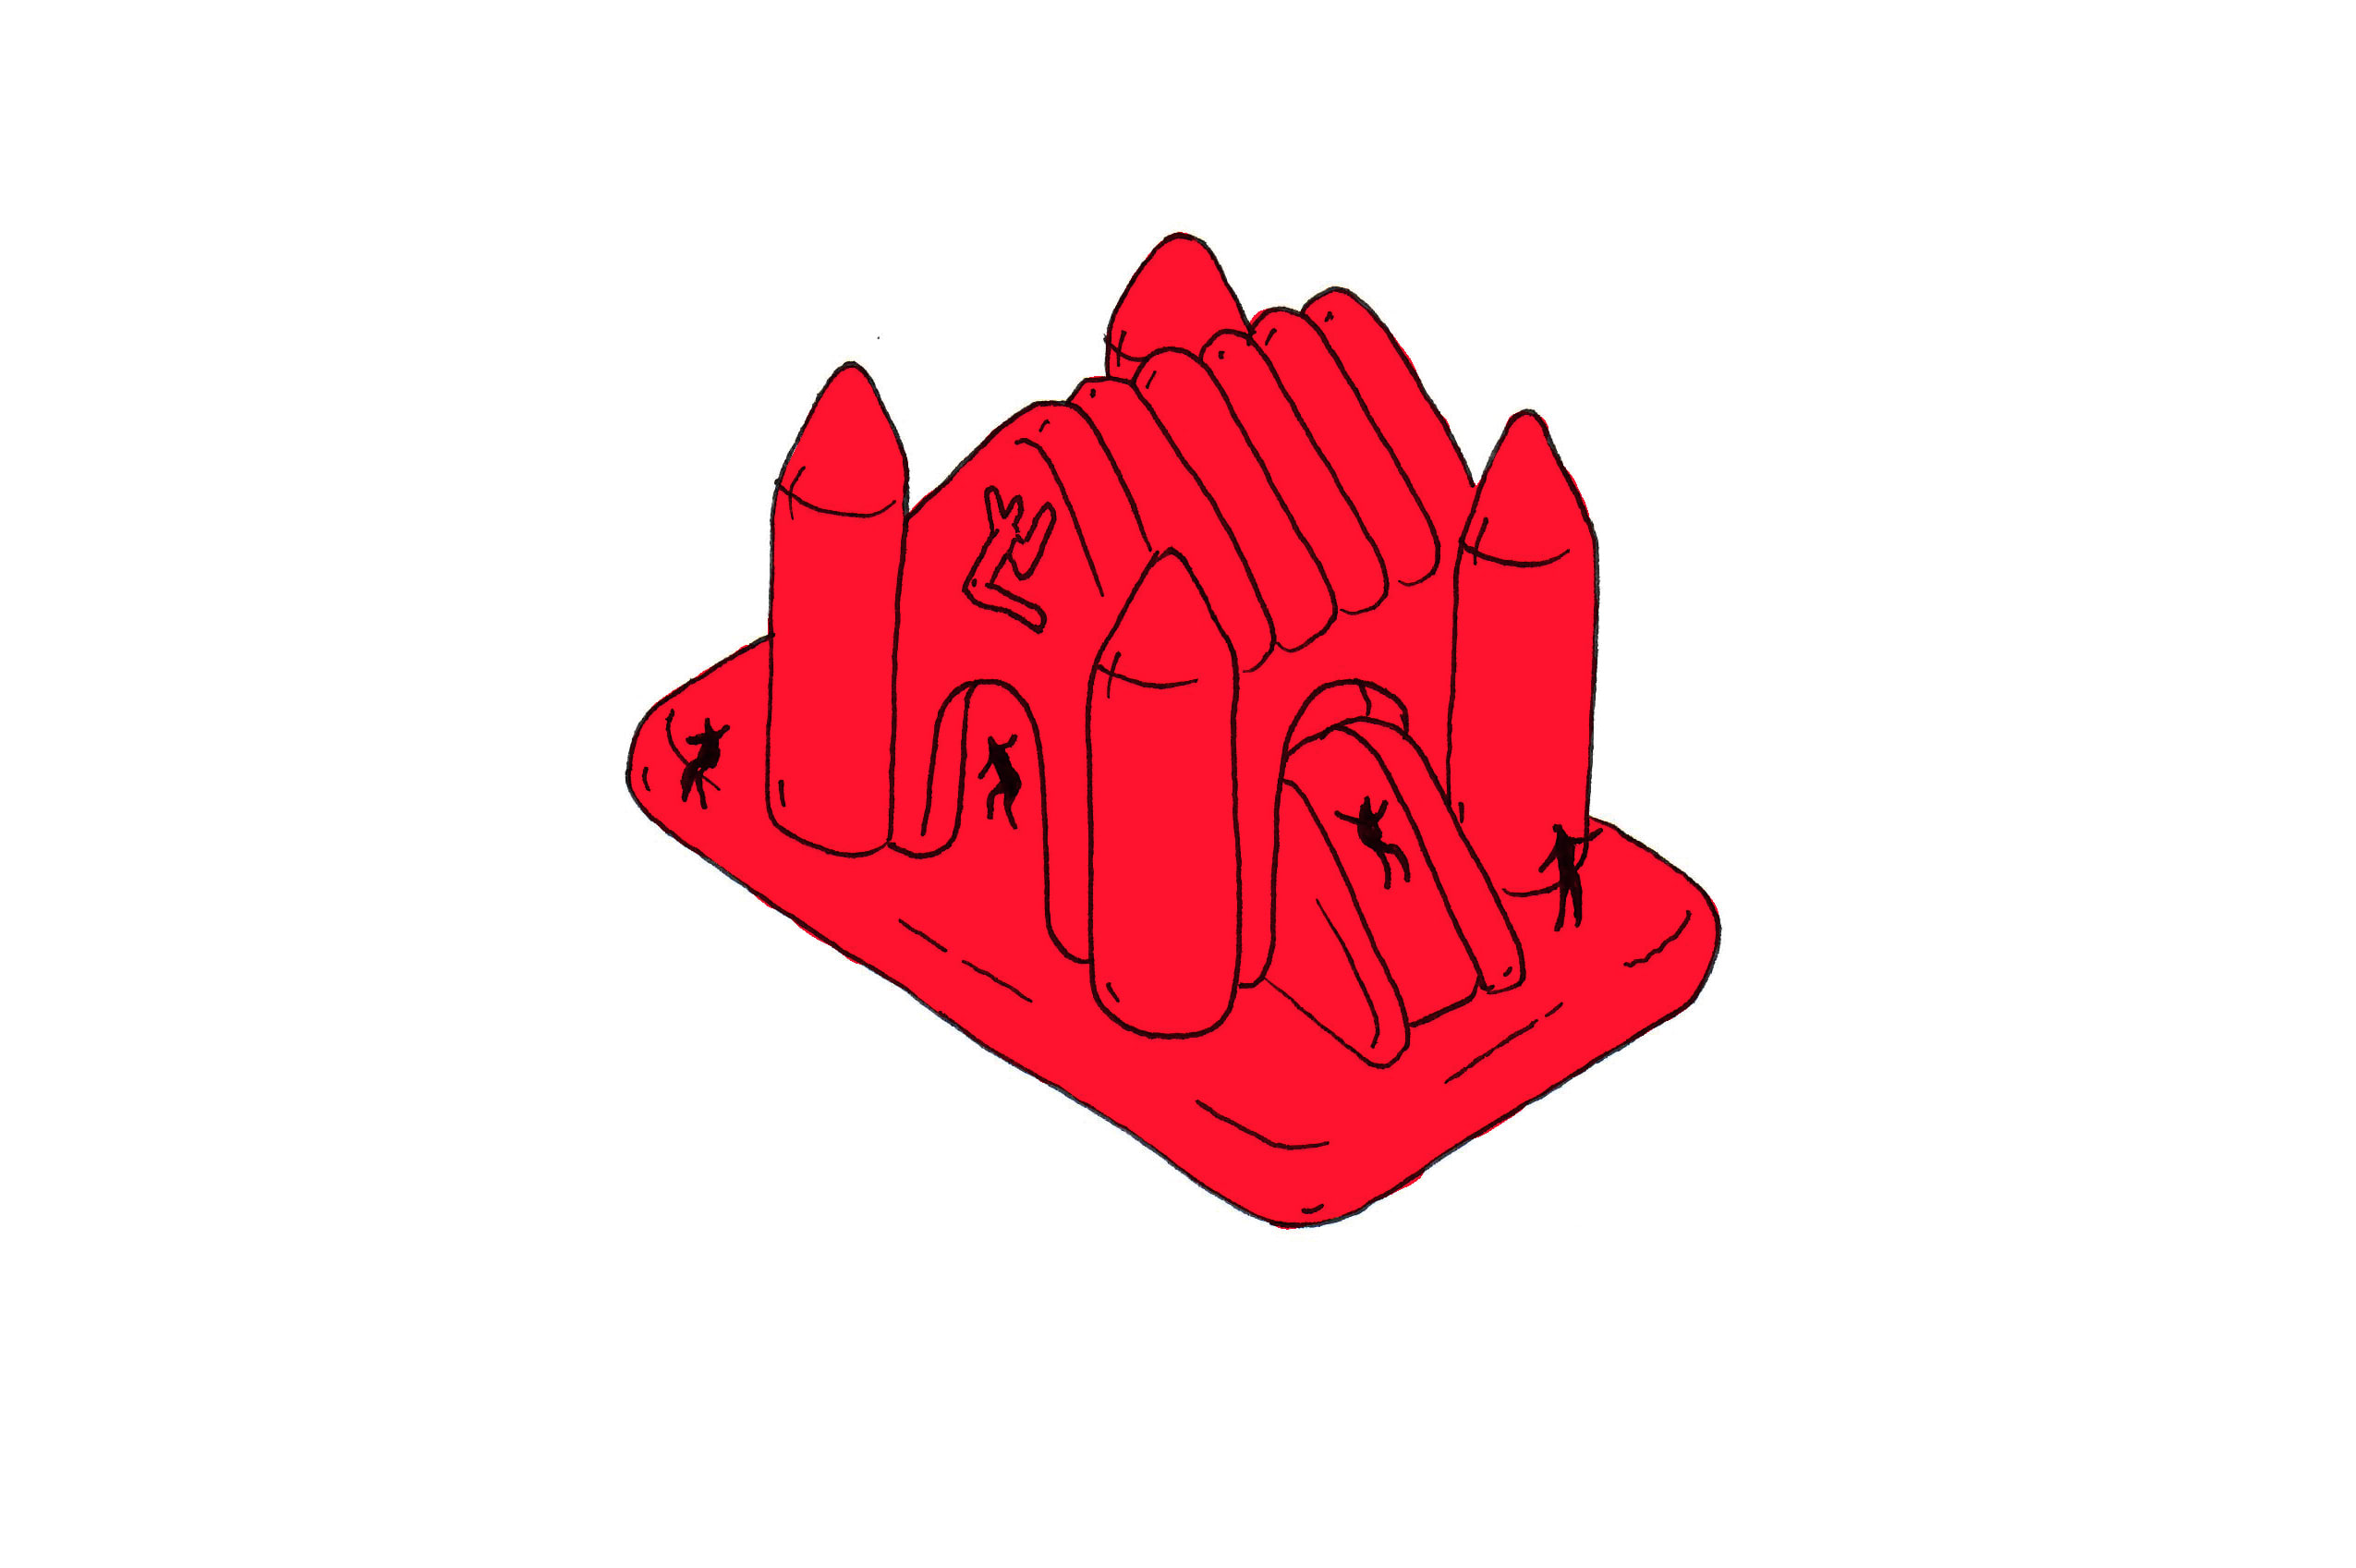 Louis Vuitton Bounce Castle Sketch by Playlab